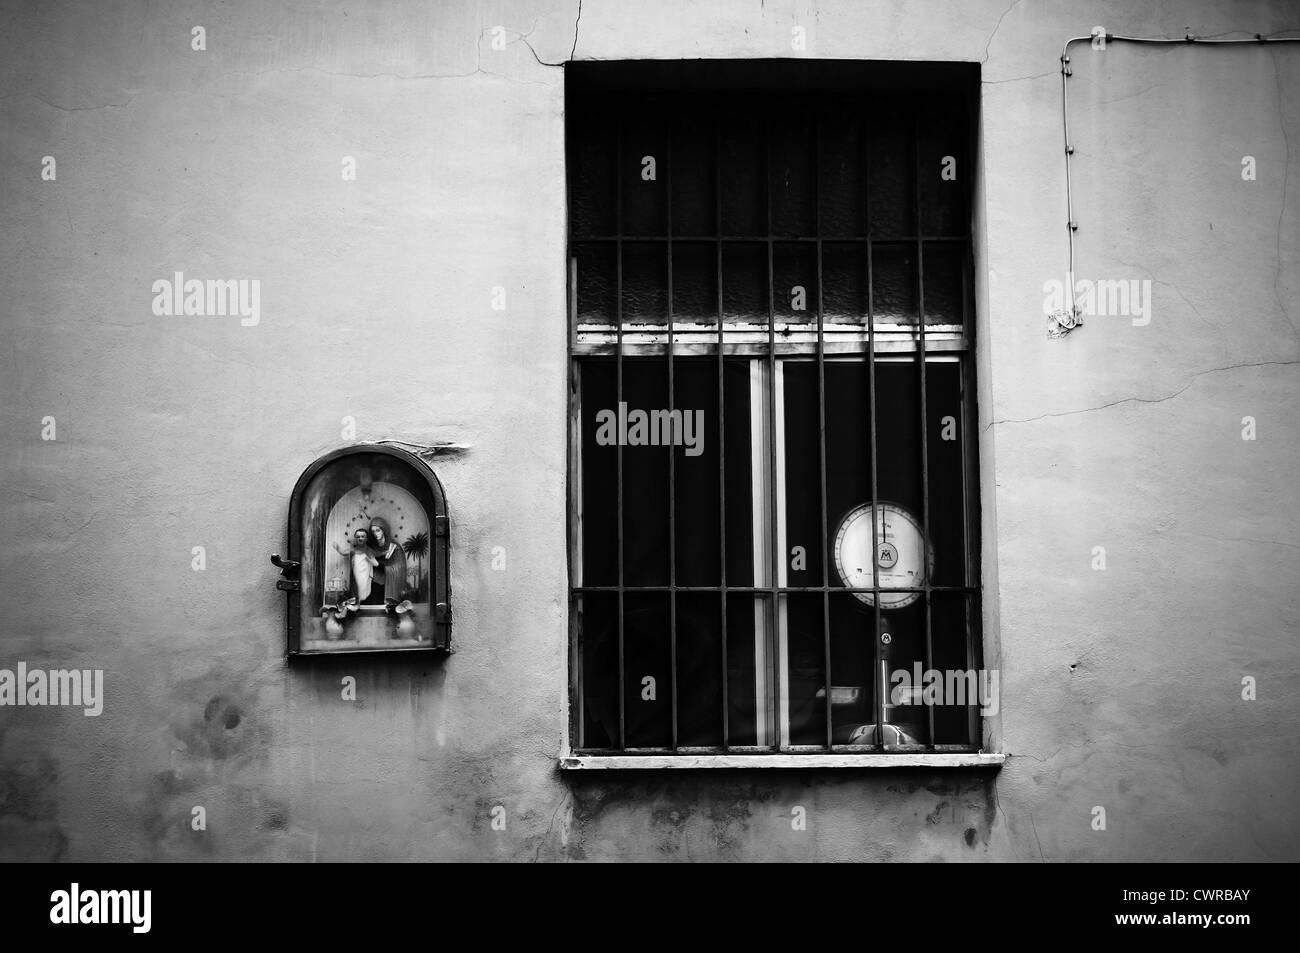 Abruzzo, Chieti. Italy. 2012 - Stock Image